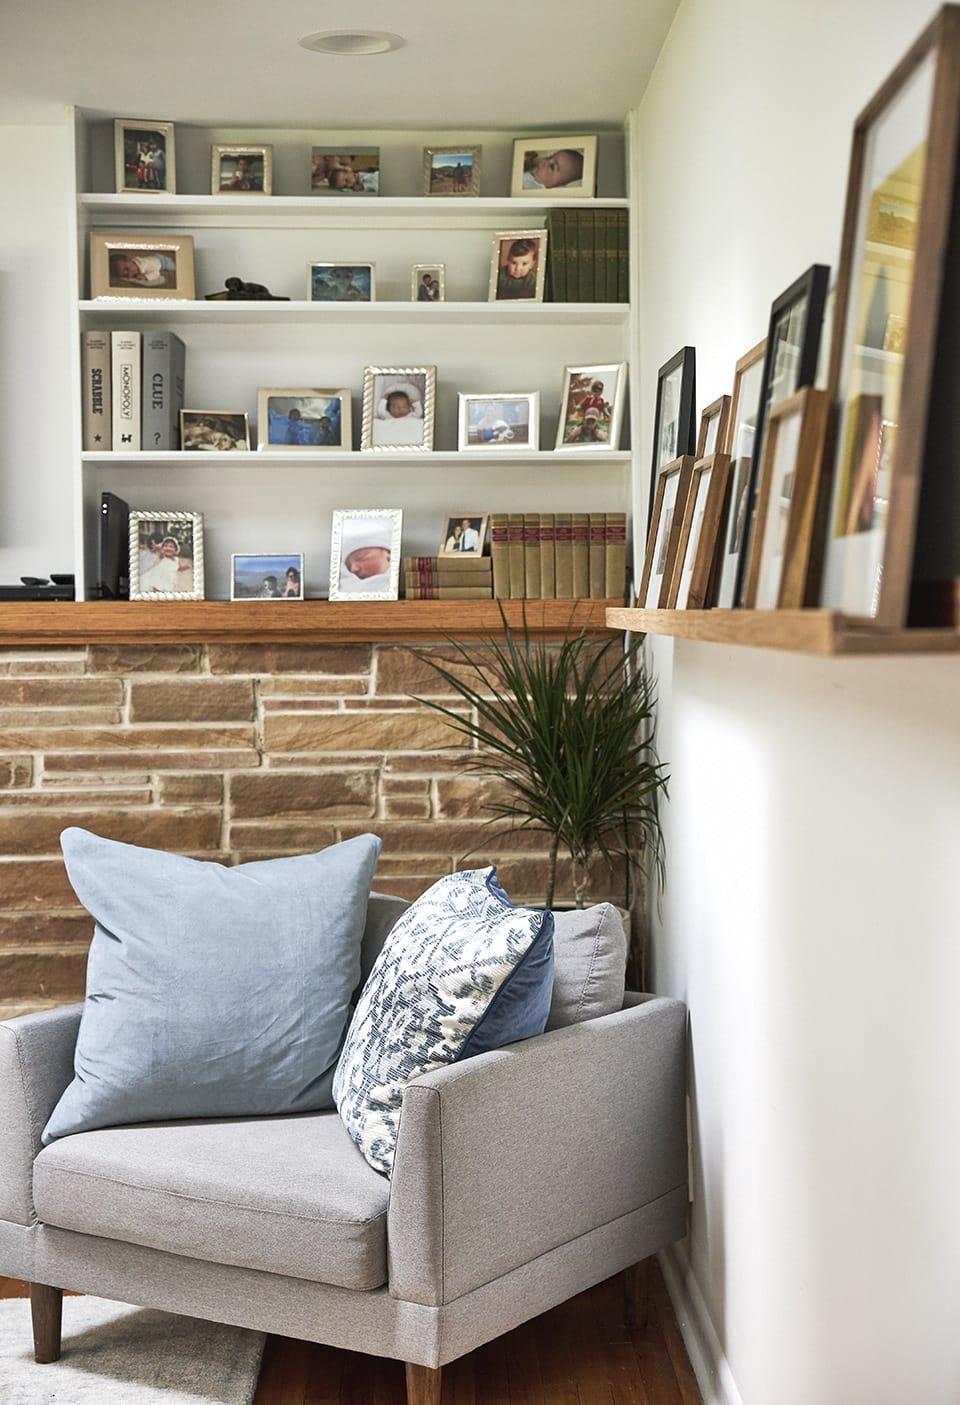 Family-photos-living-room-feat.jpg#asset:4153